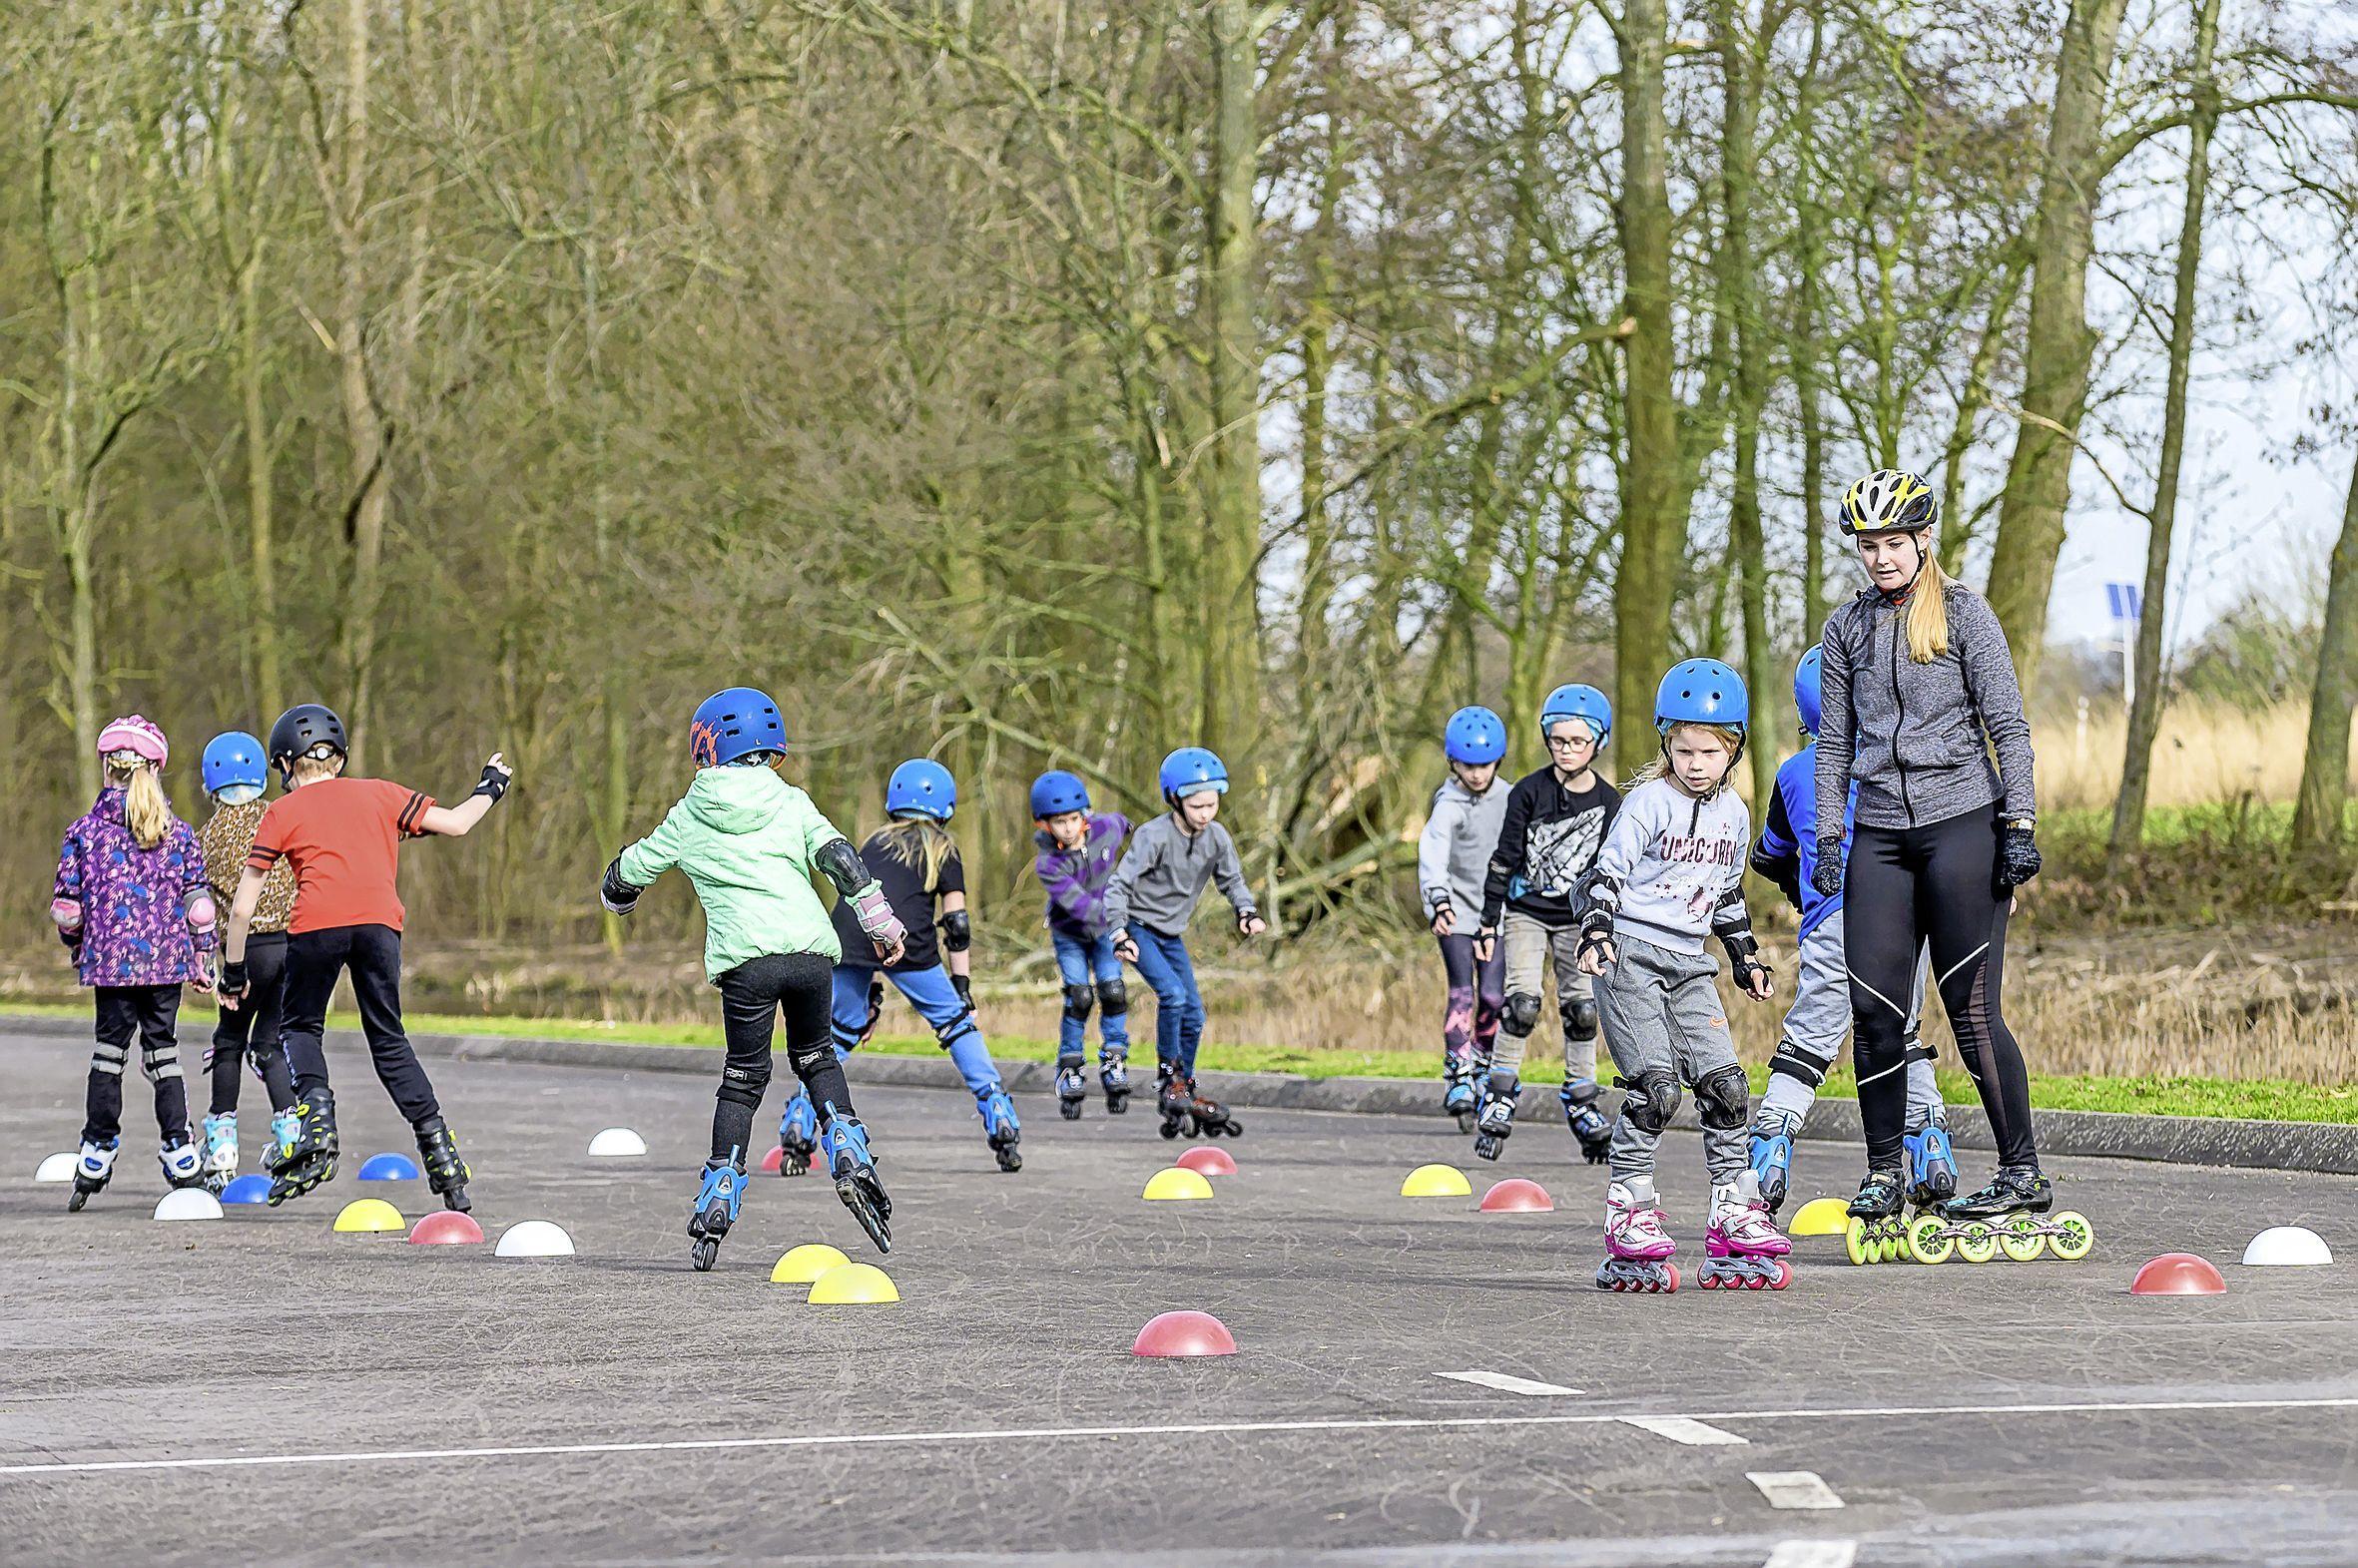 Kids Kinderopvang uit Purmerend opent Sport BSO in Wormer